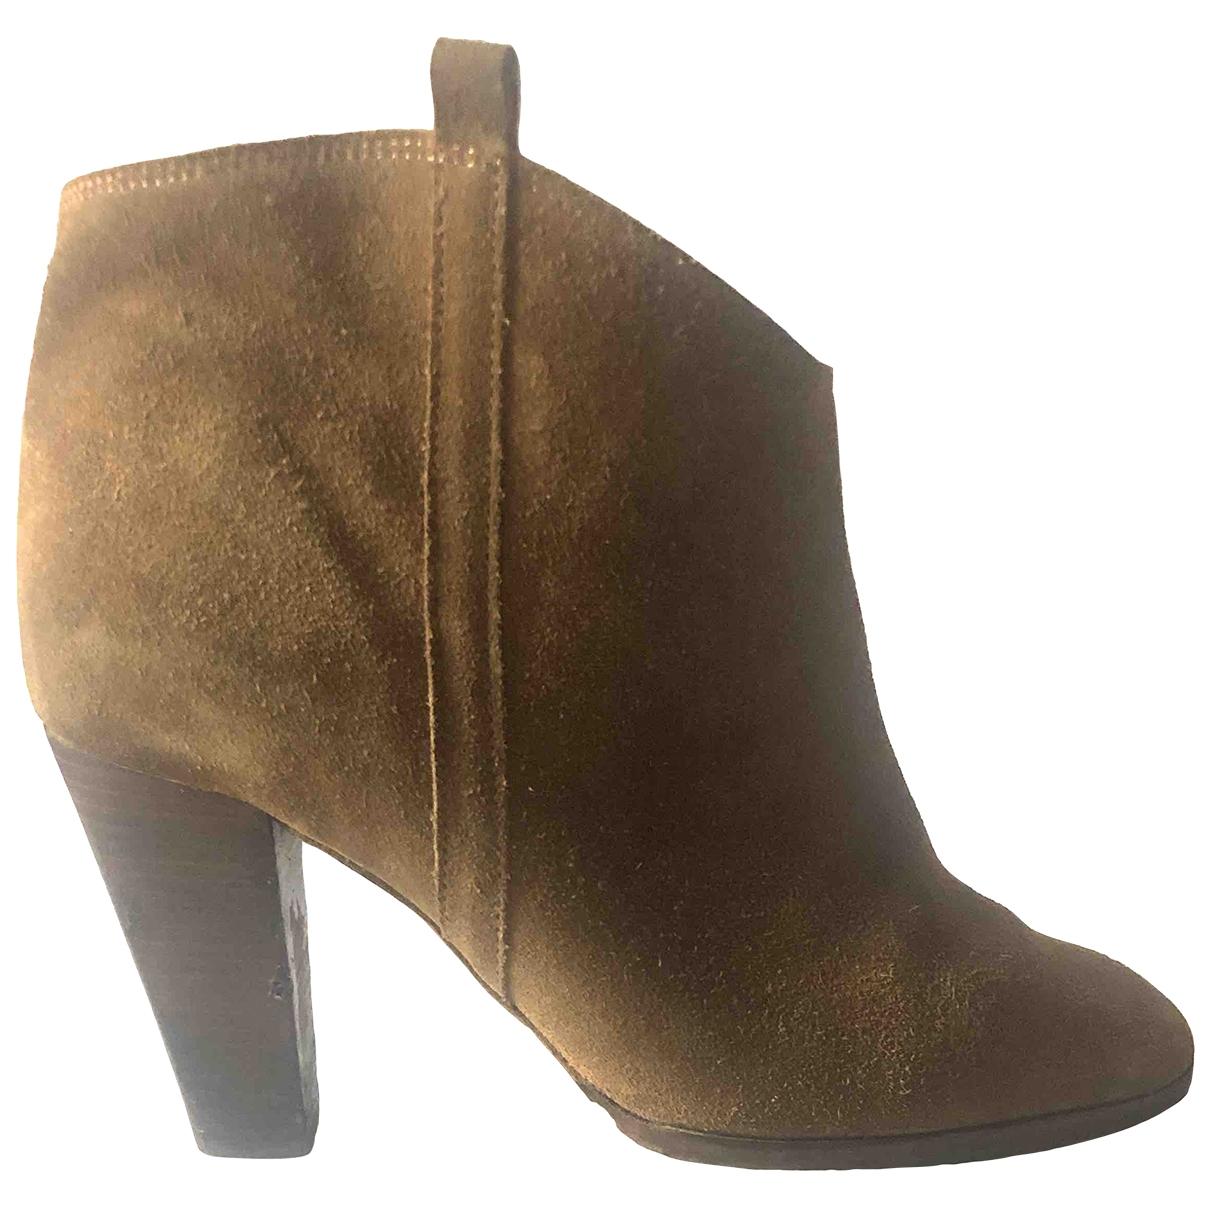 Isabel Marant - Boots Dicker pour femme en suede - camel